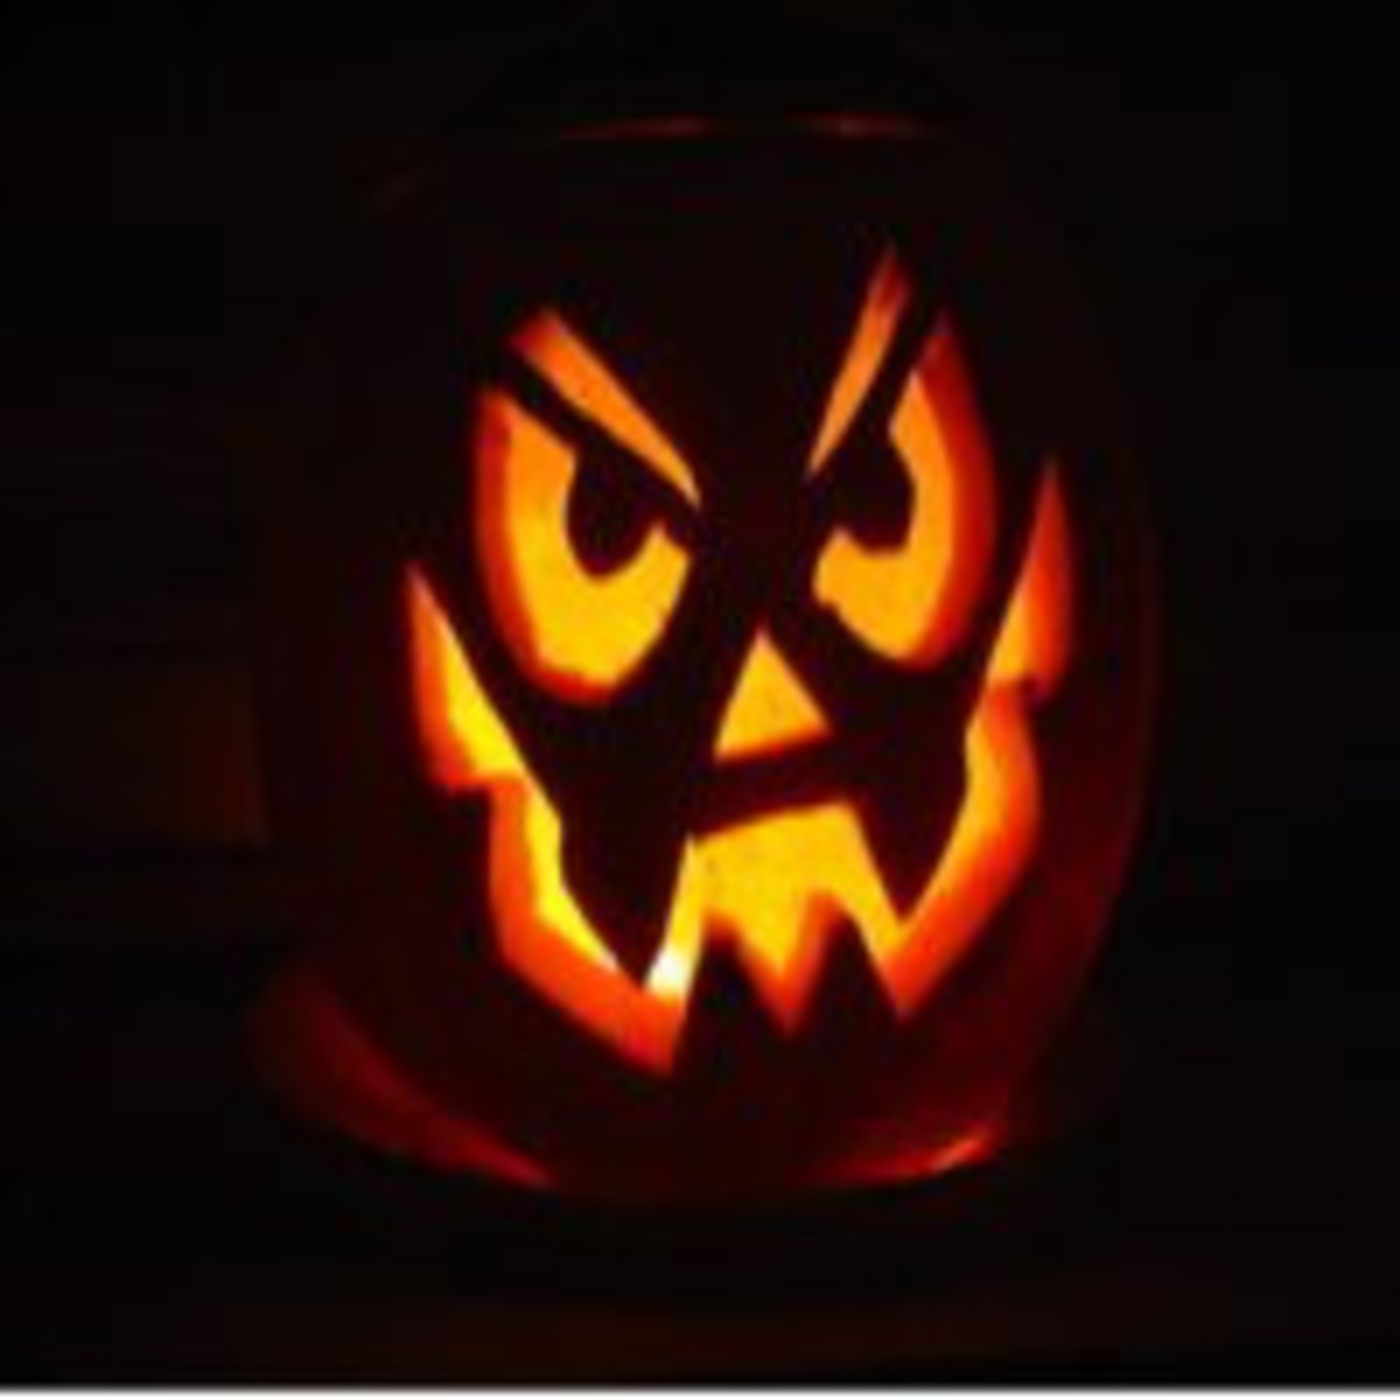 3x06 - Especial Halloween